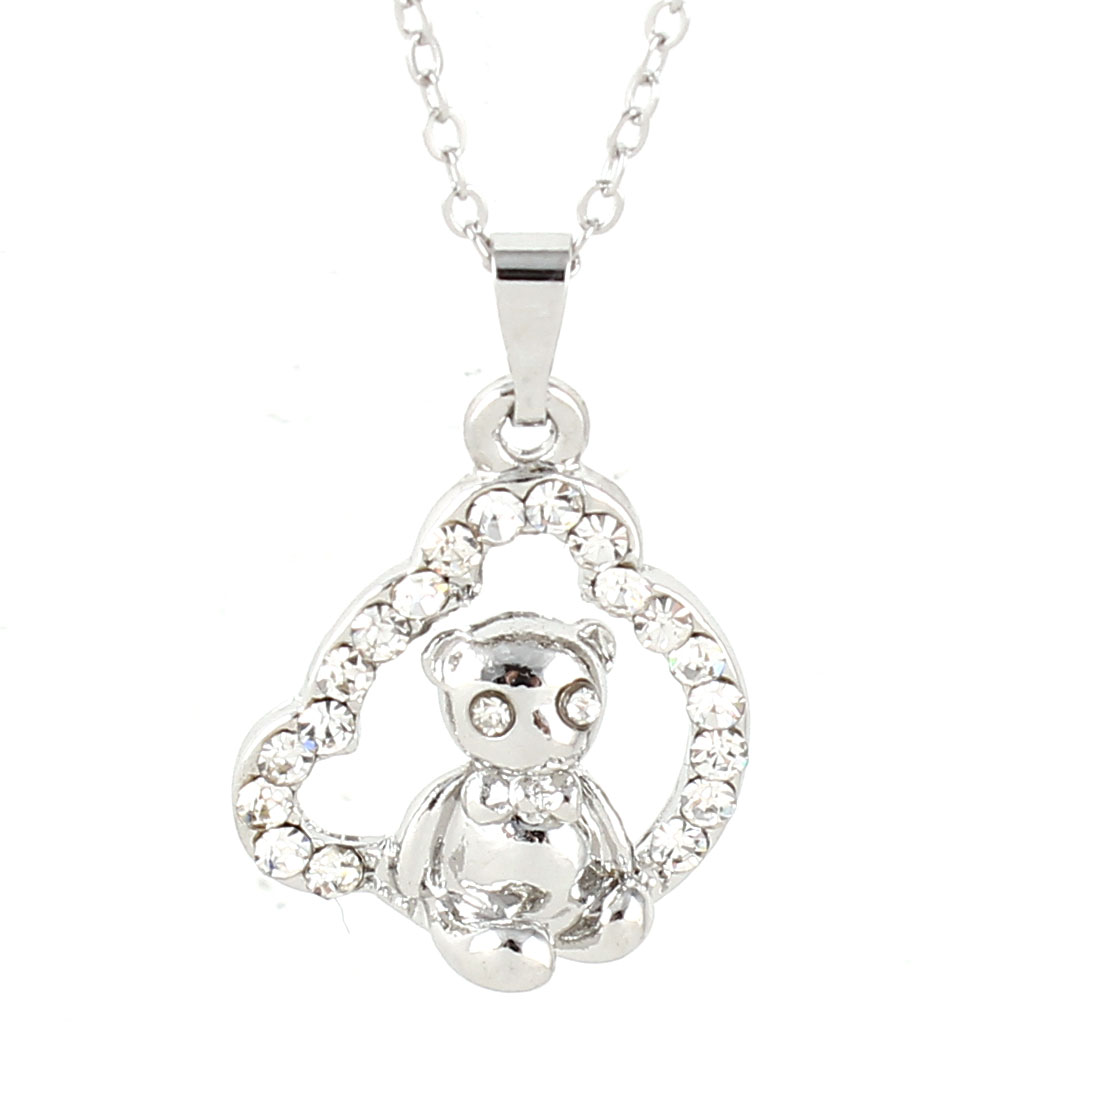 Lady Silver Tone Chain Link Swing Bear Pendant Rhinestone Detailing Necklace